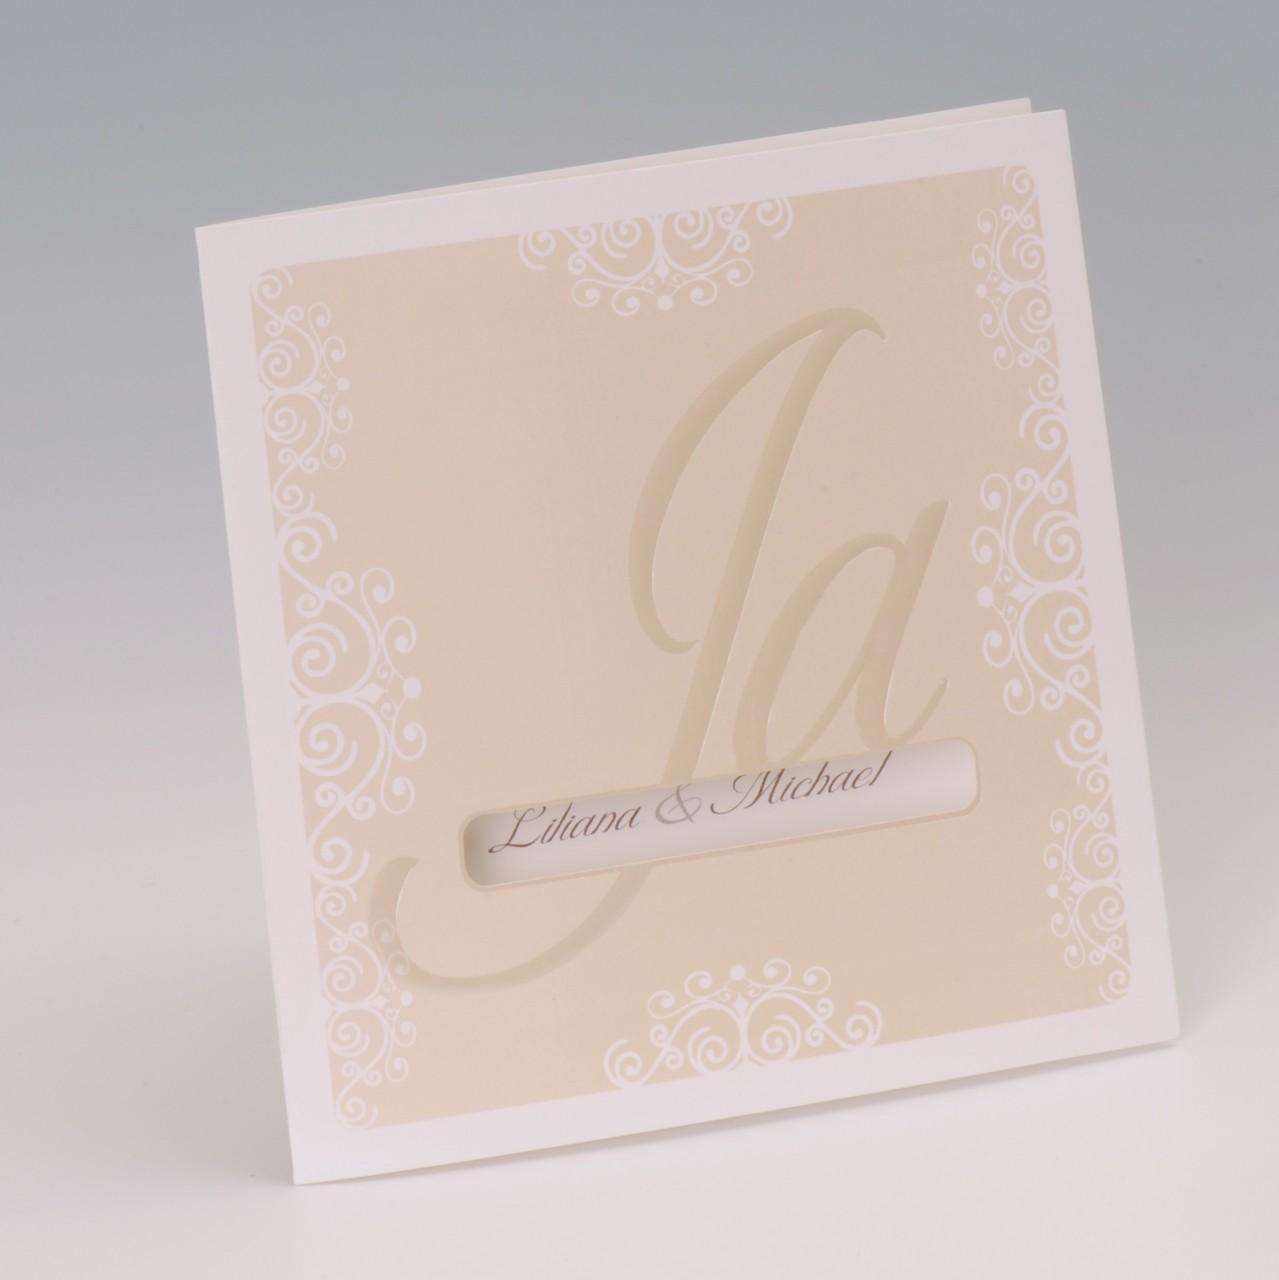 Einladungskarte - H 1989